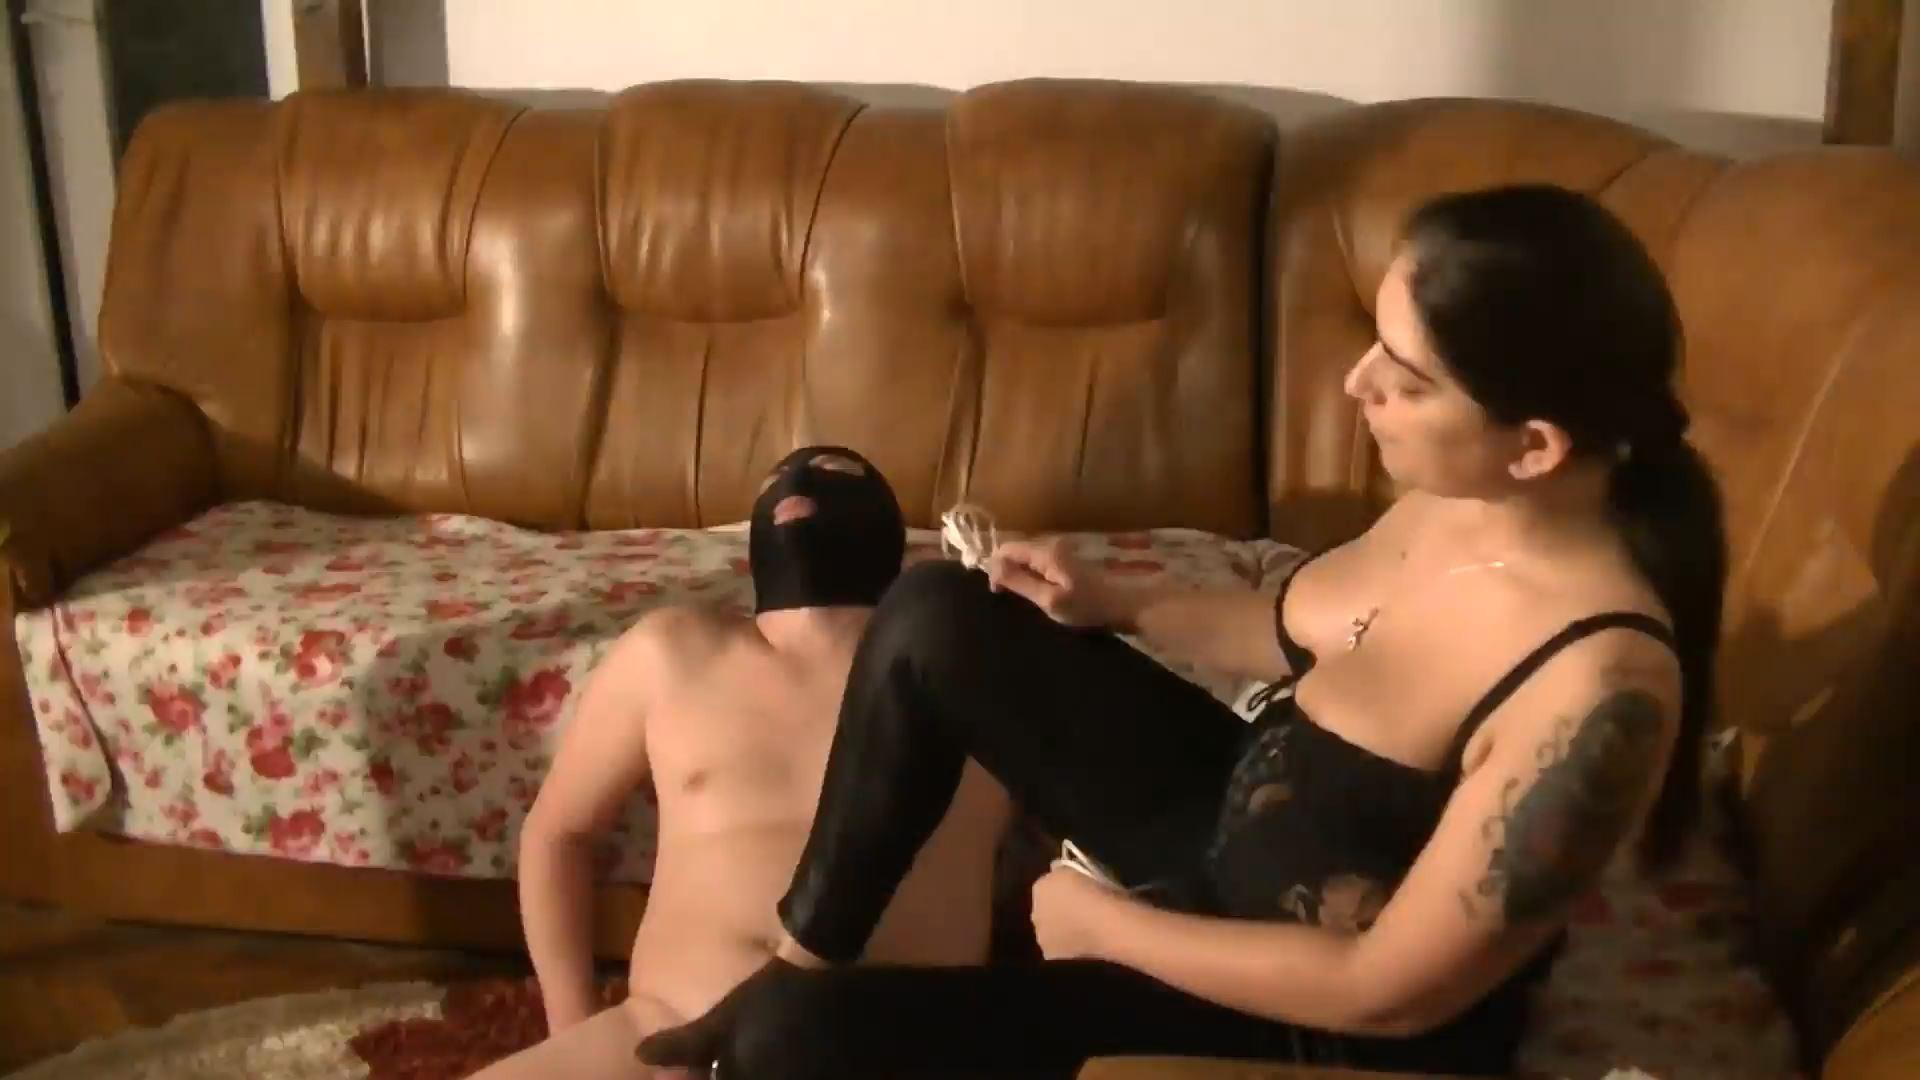 Mistress Roberta - farting in bondage and humiliation - BIZARRE GODDESSES - FULL HD/1080p/MP4